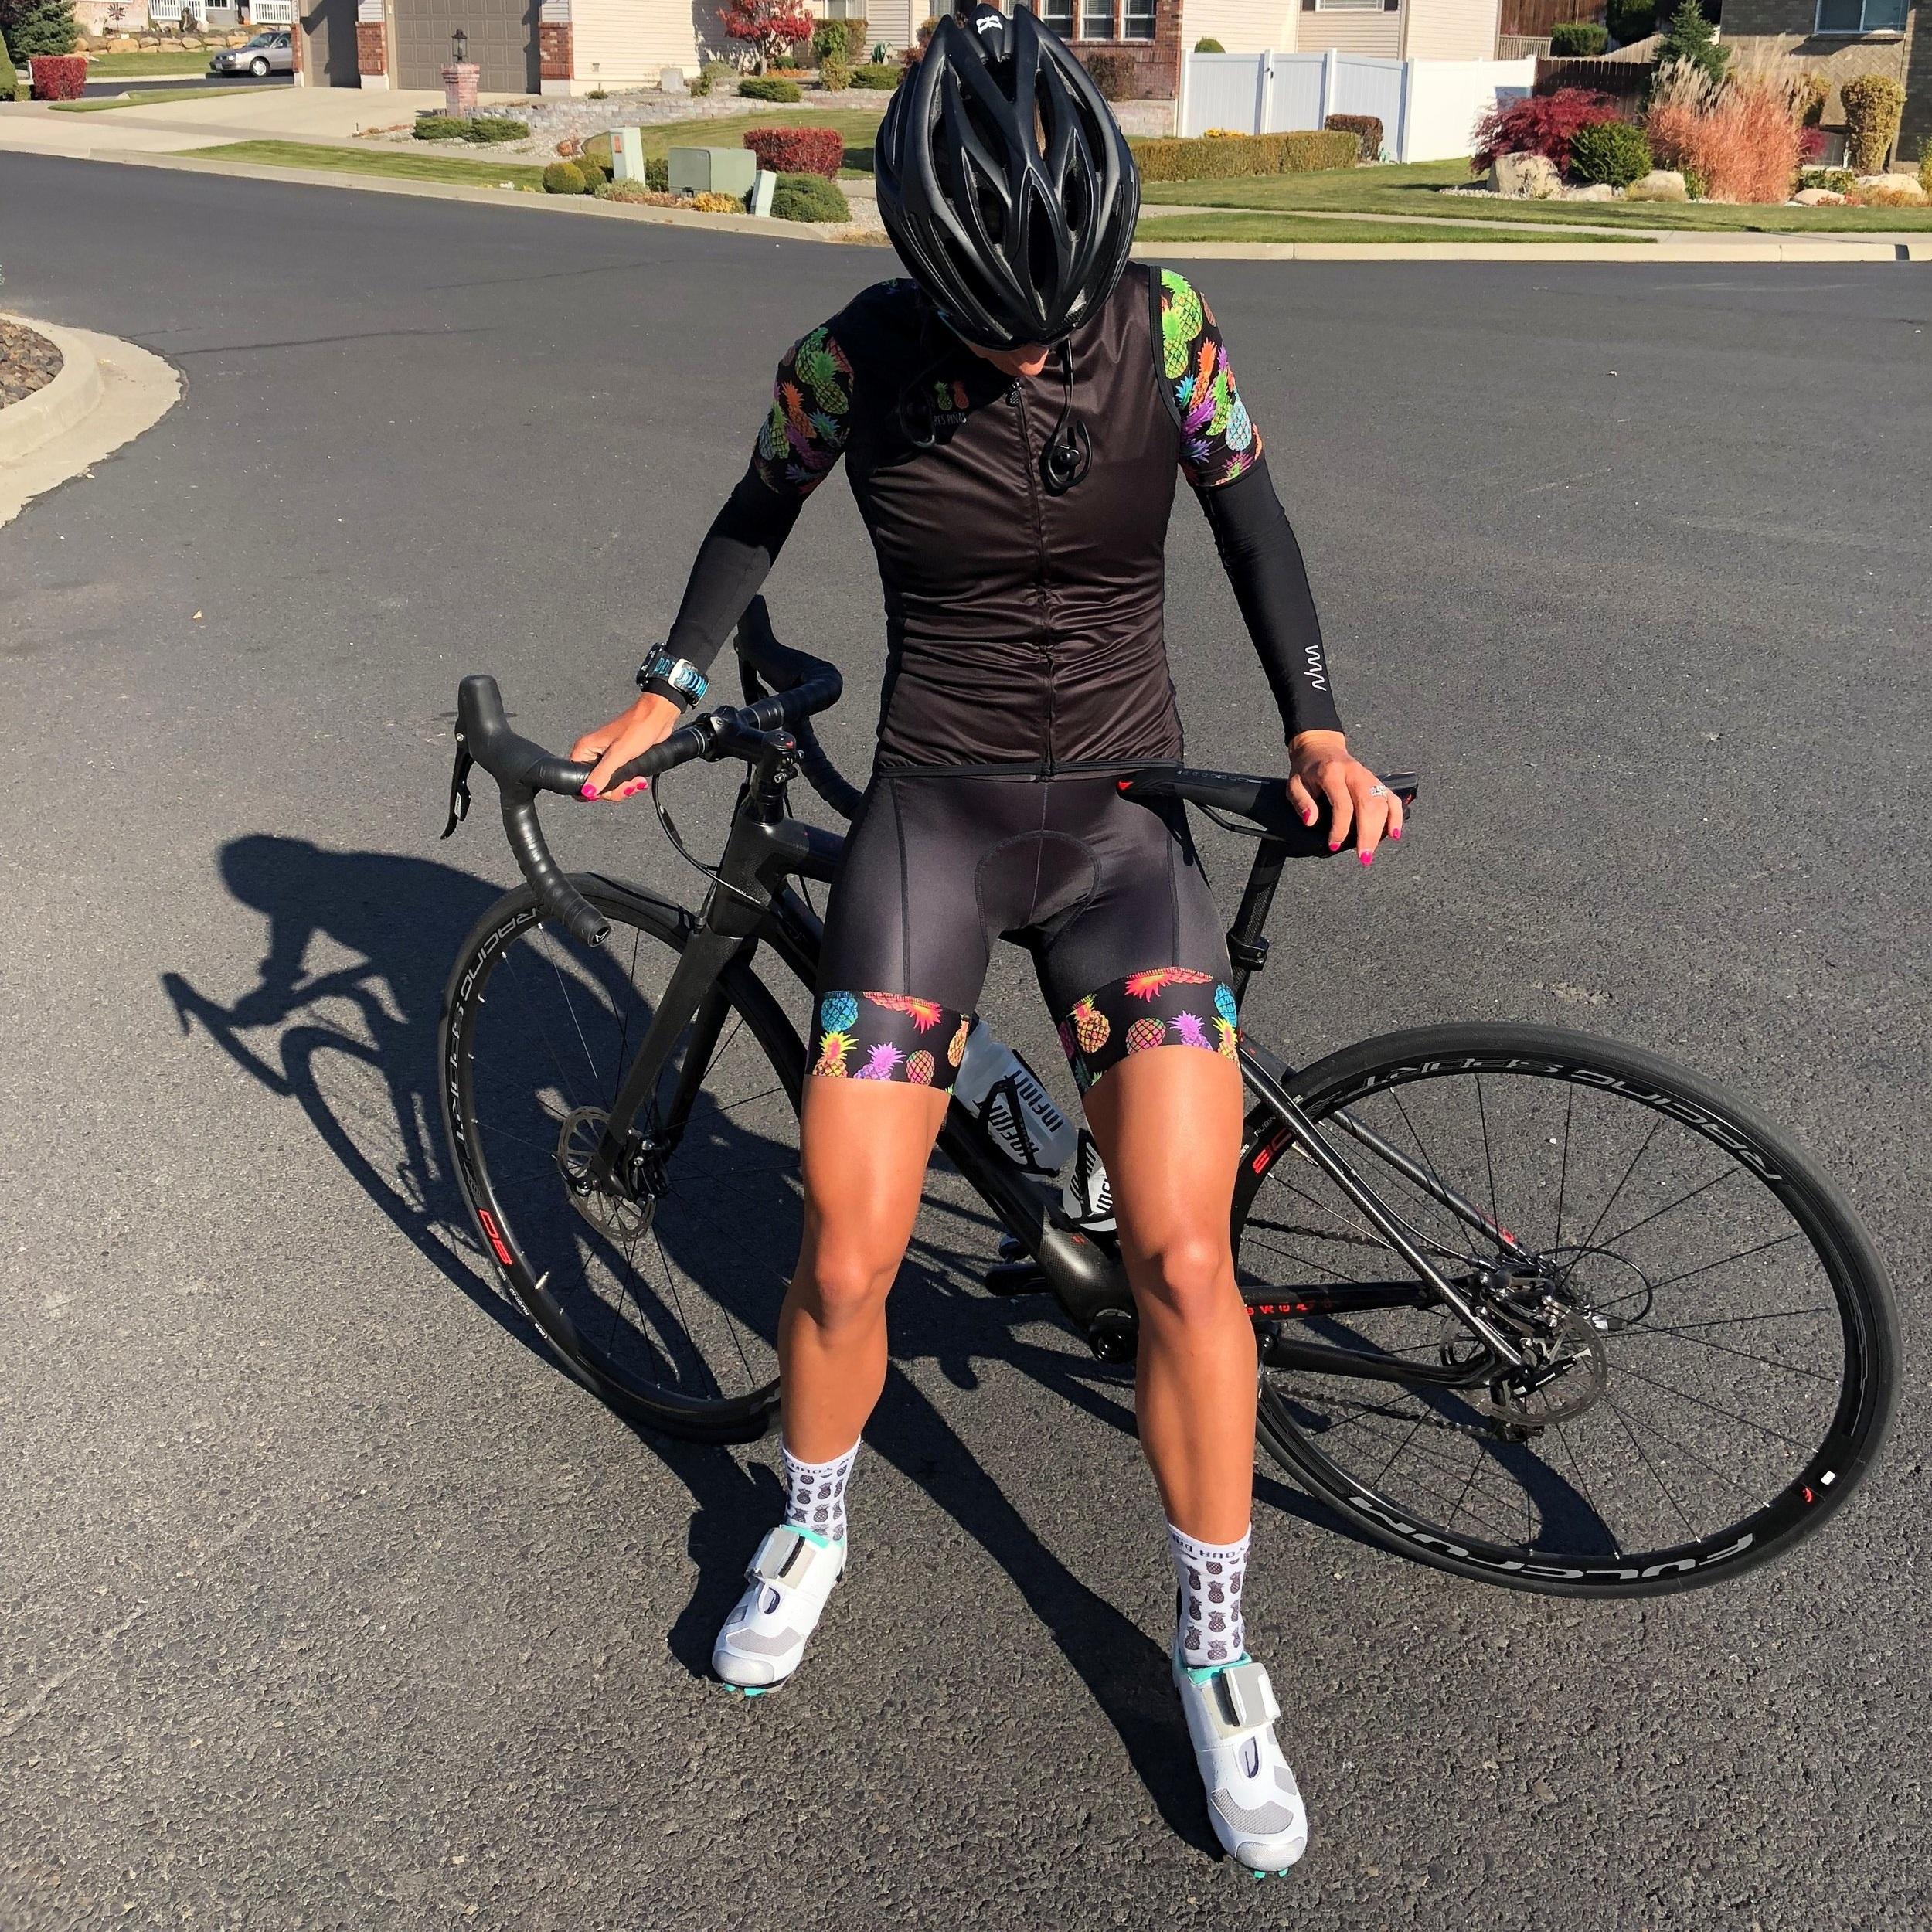 off+season+bike.jpg